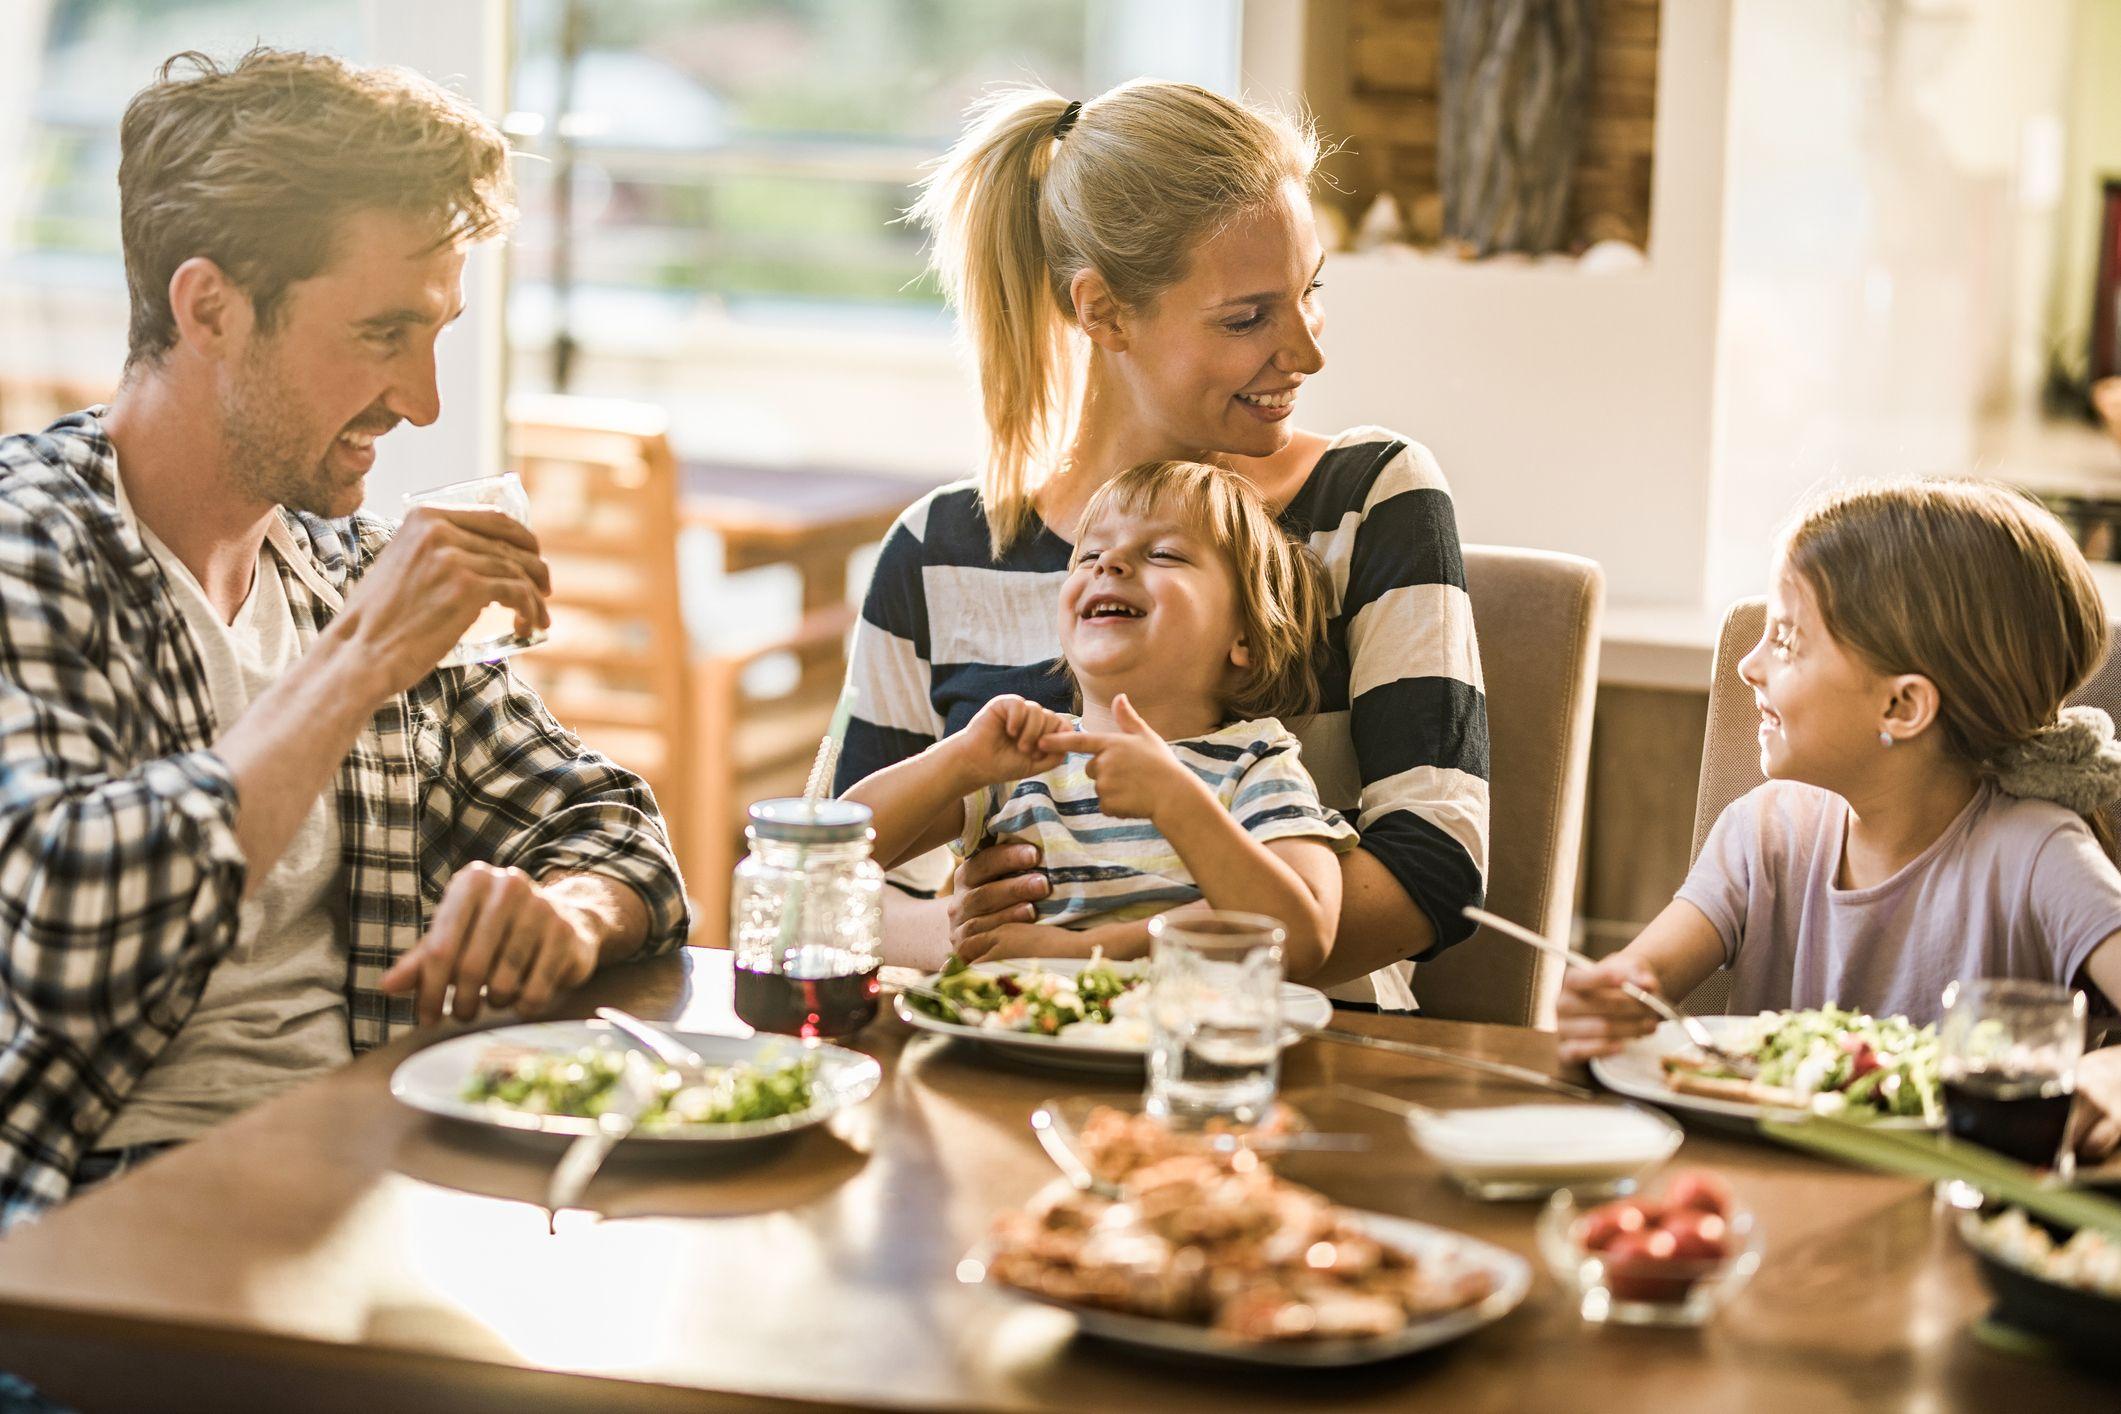 Naples Italy Restaurants Open On Christmas Day 2020 26 Restaurants Open for Takeout Mother's Day 2020   To Go Mother's